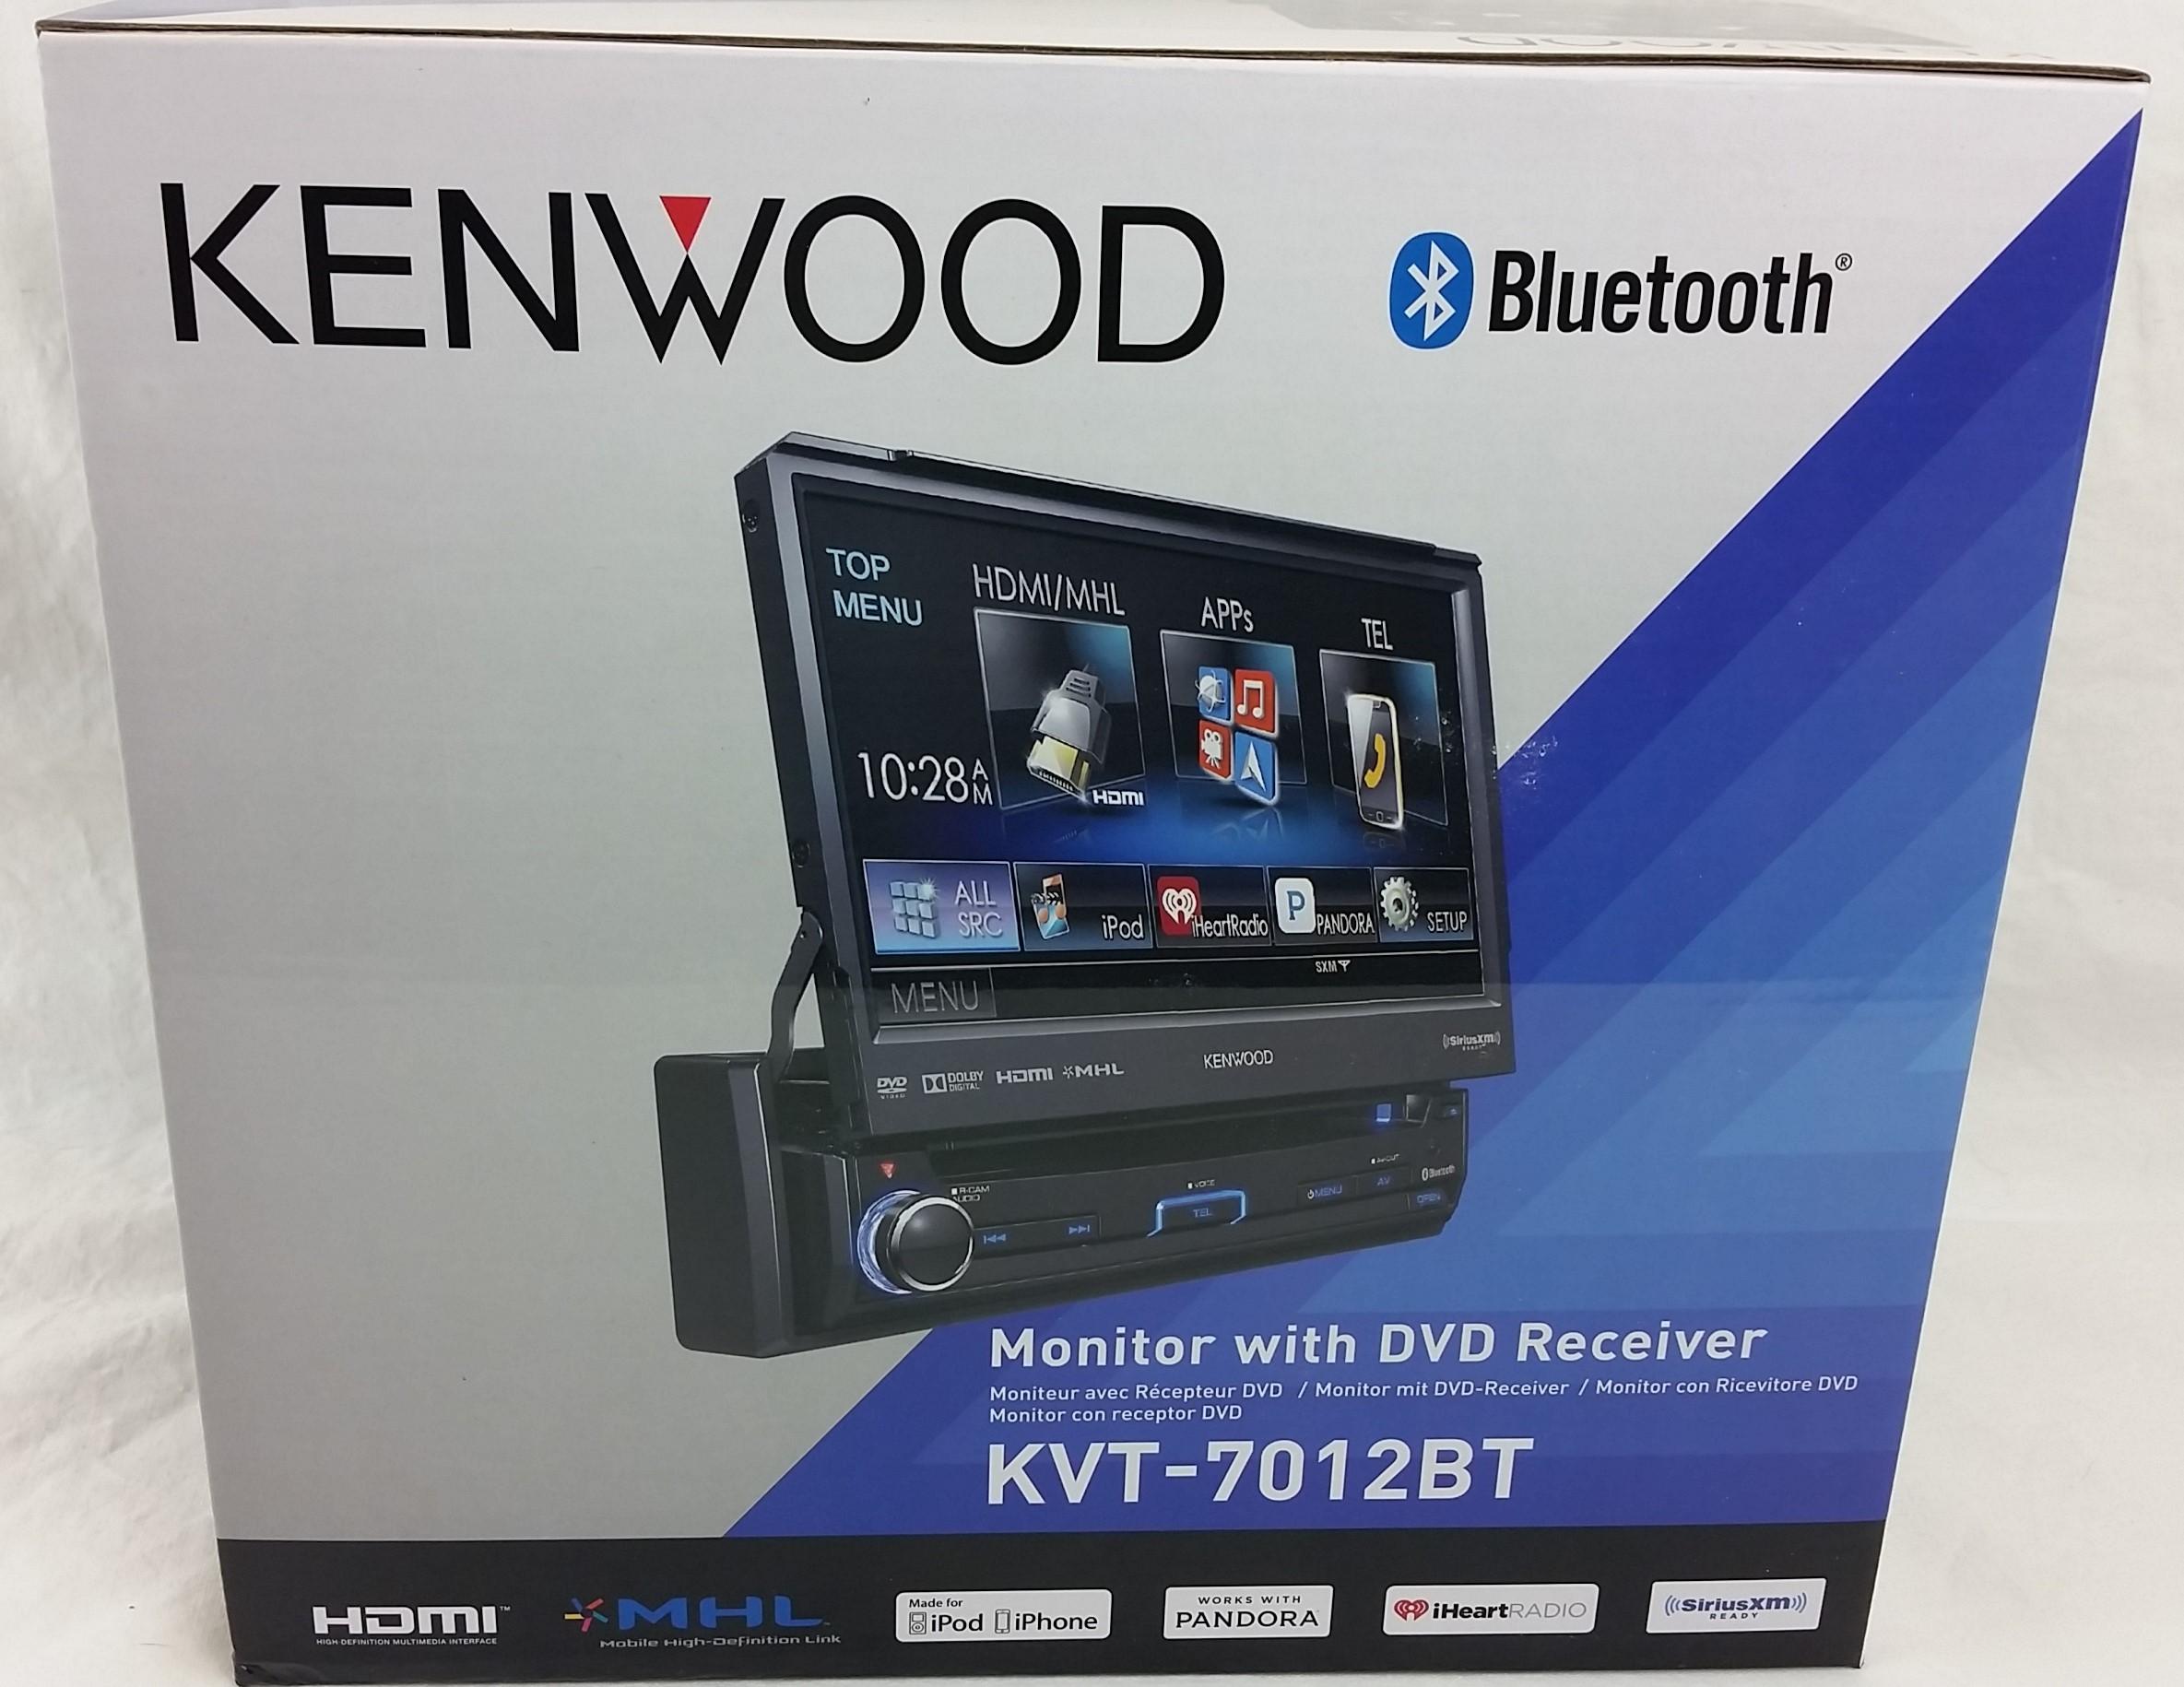 "Kenwood KVT-7012BT 6.95"" Single DIN Bluetooth In-Dash Flip"